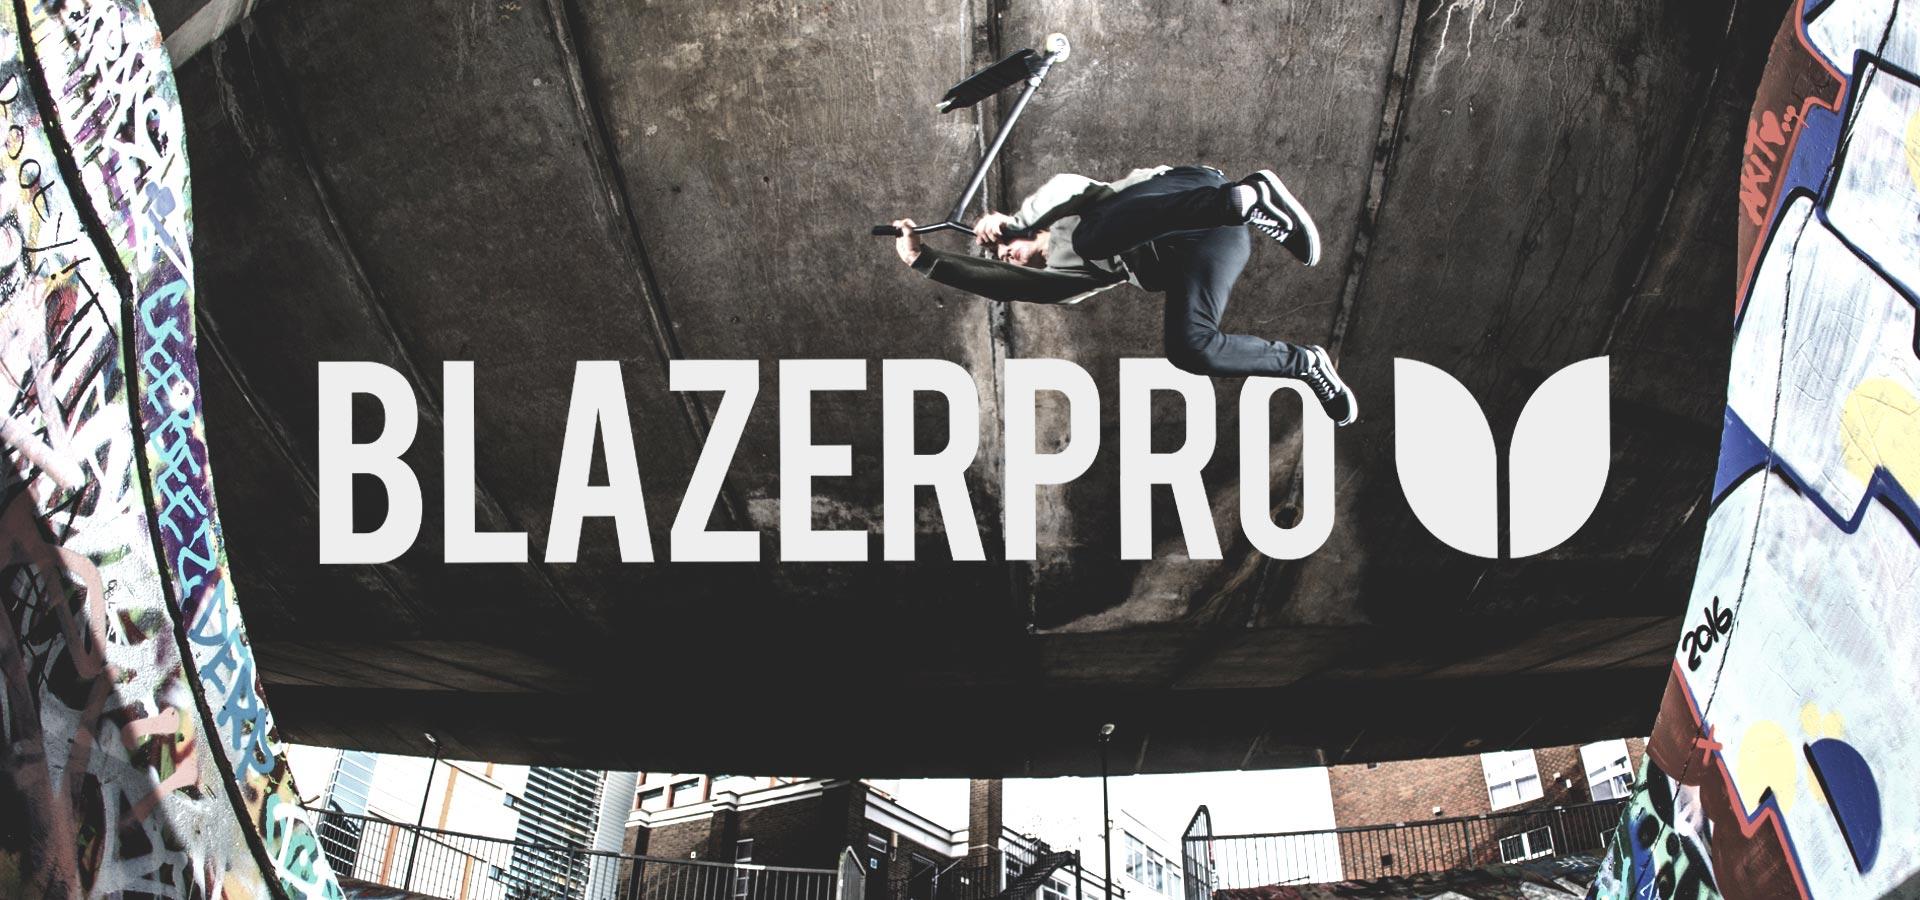 Blazer-Pro-LDN-2016-homepage-1